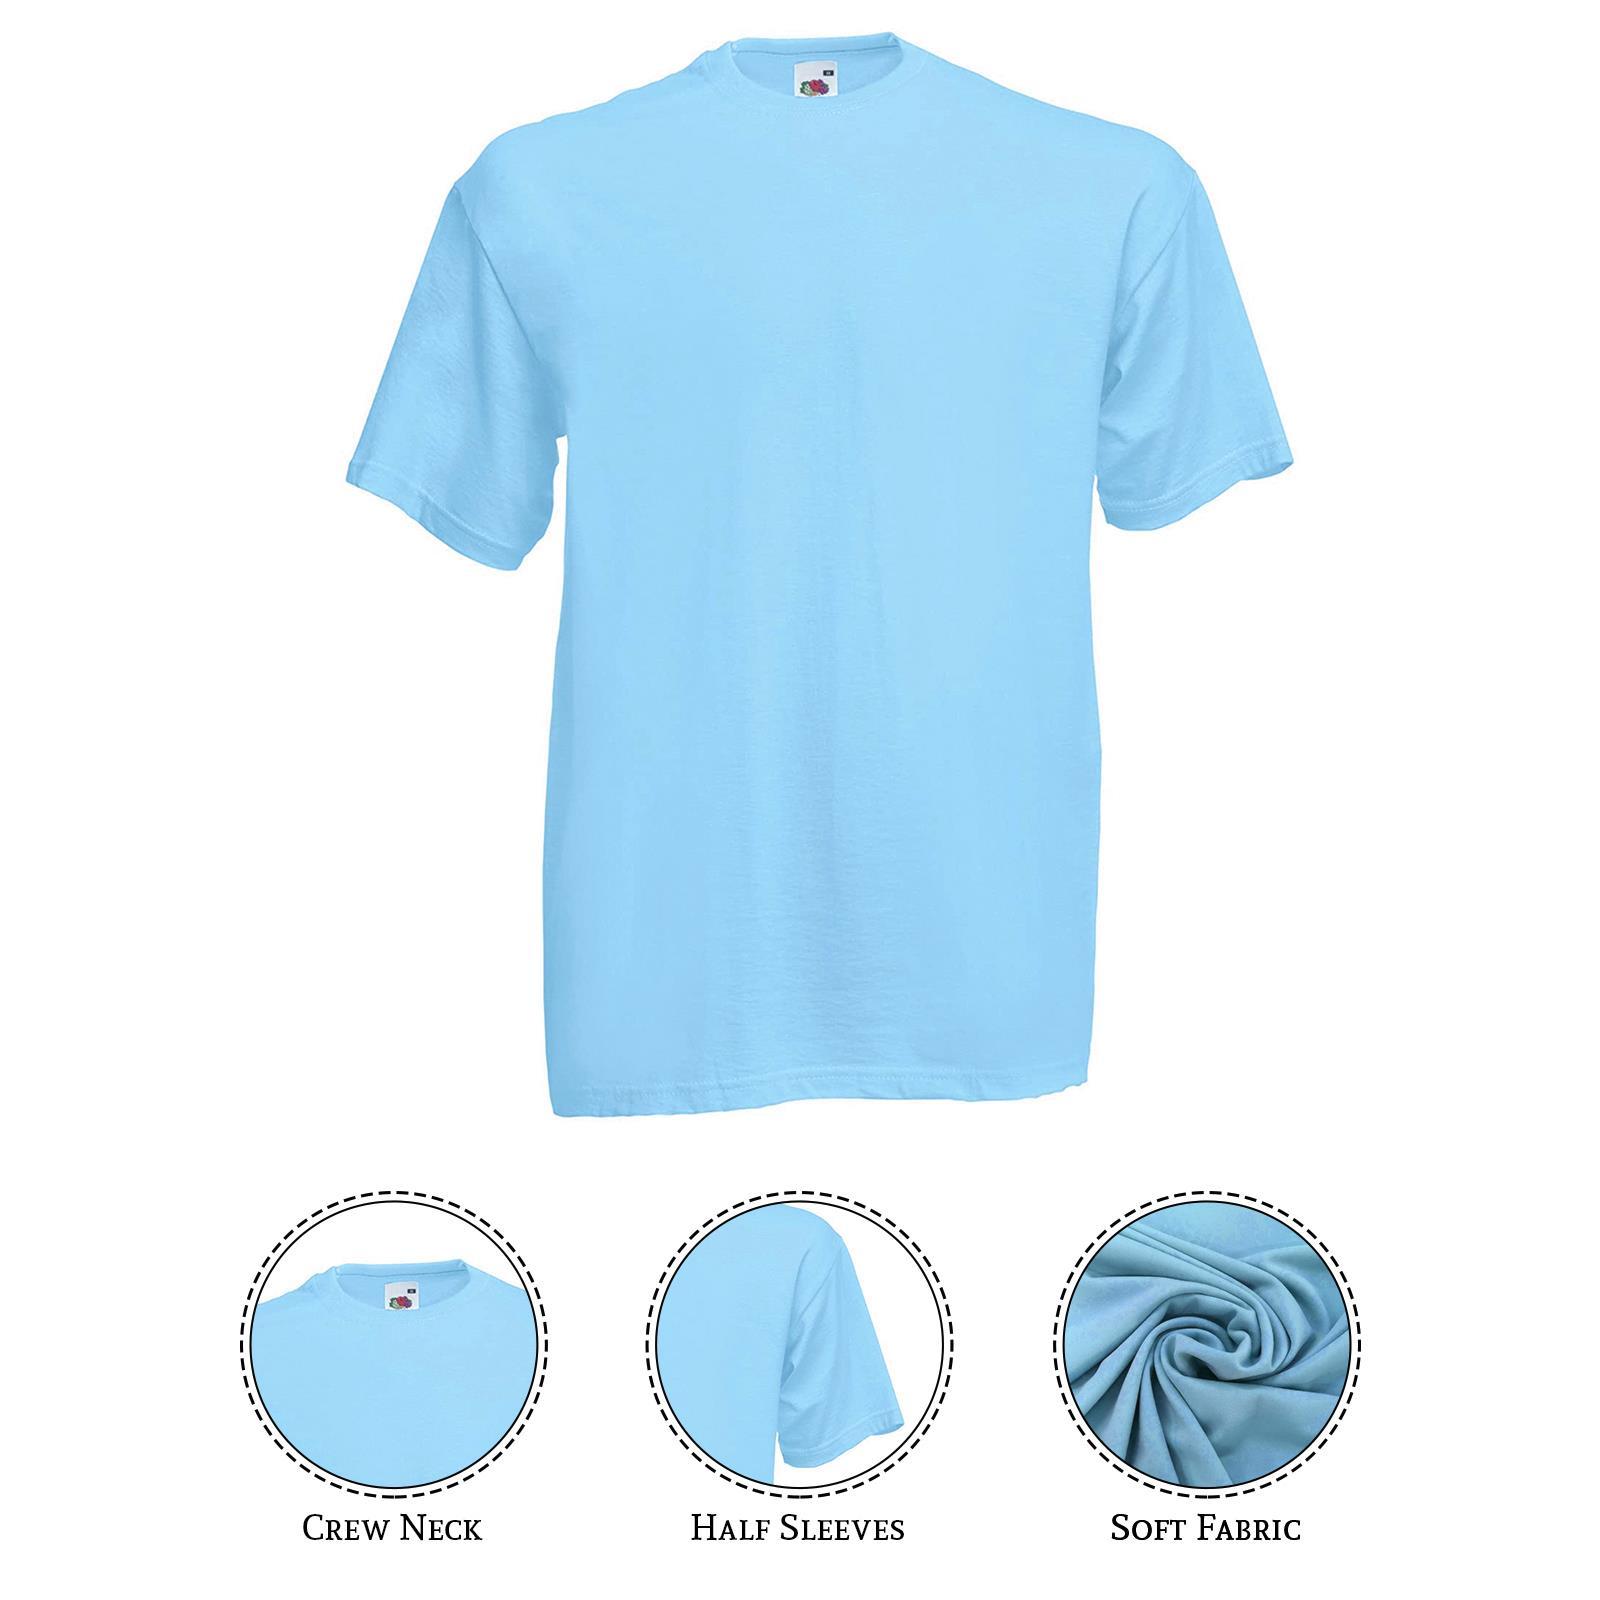 thumbnail 39 - Men-s-Fruit-Of-The-Loom-T-Shirt-Original-100-Cotton-Casual-Plain-Top-Tee